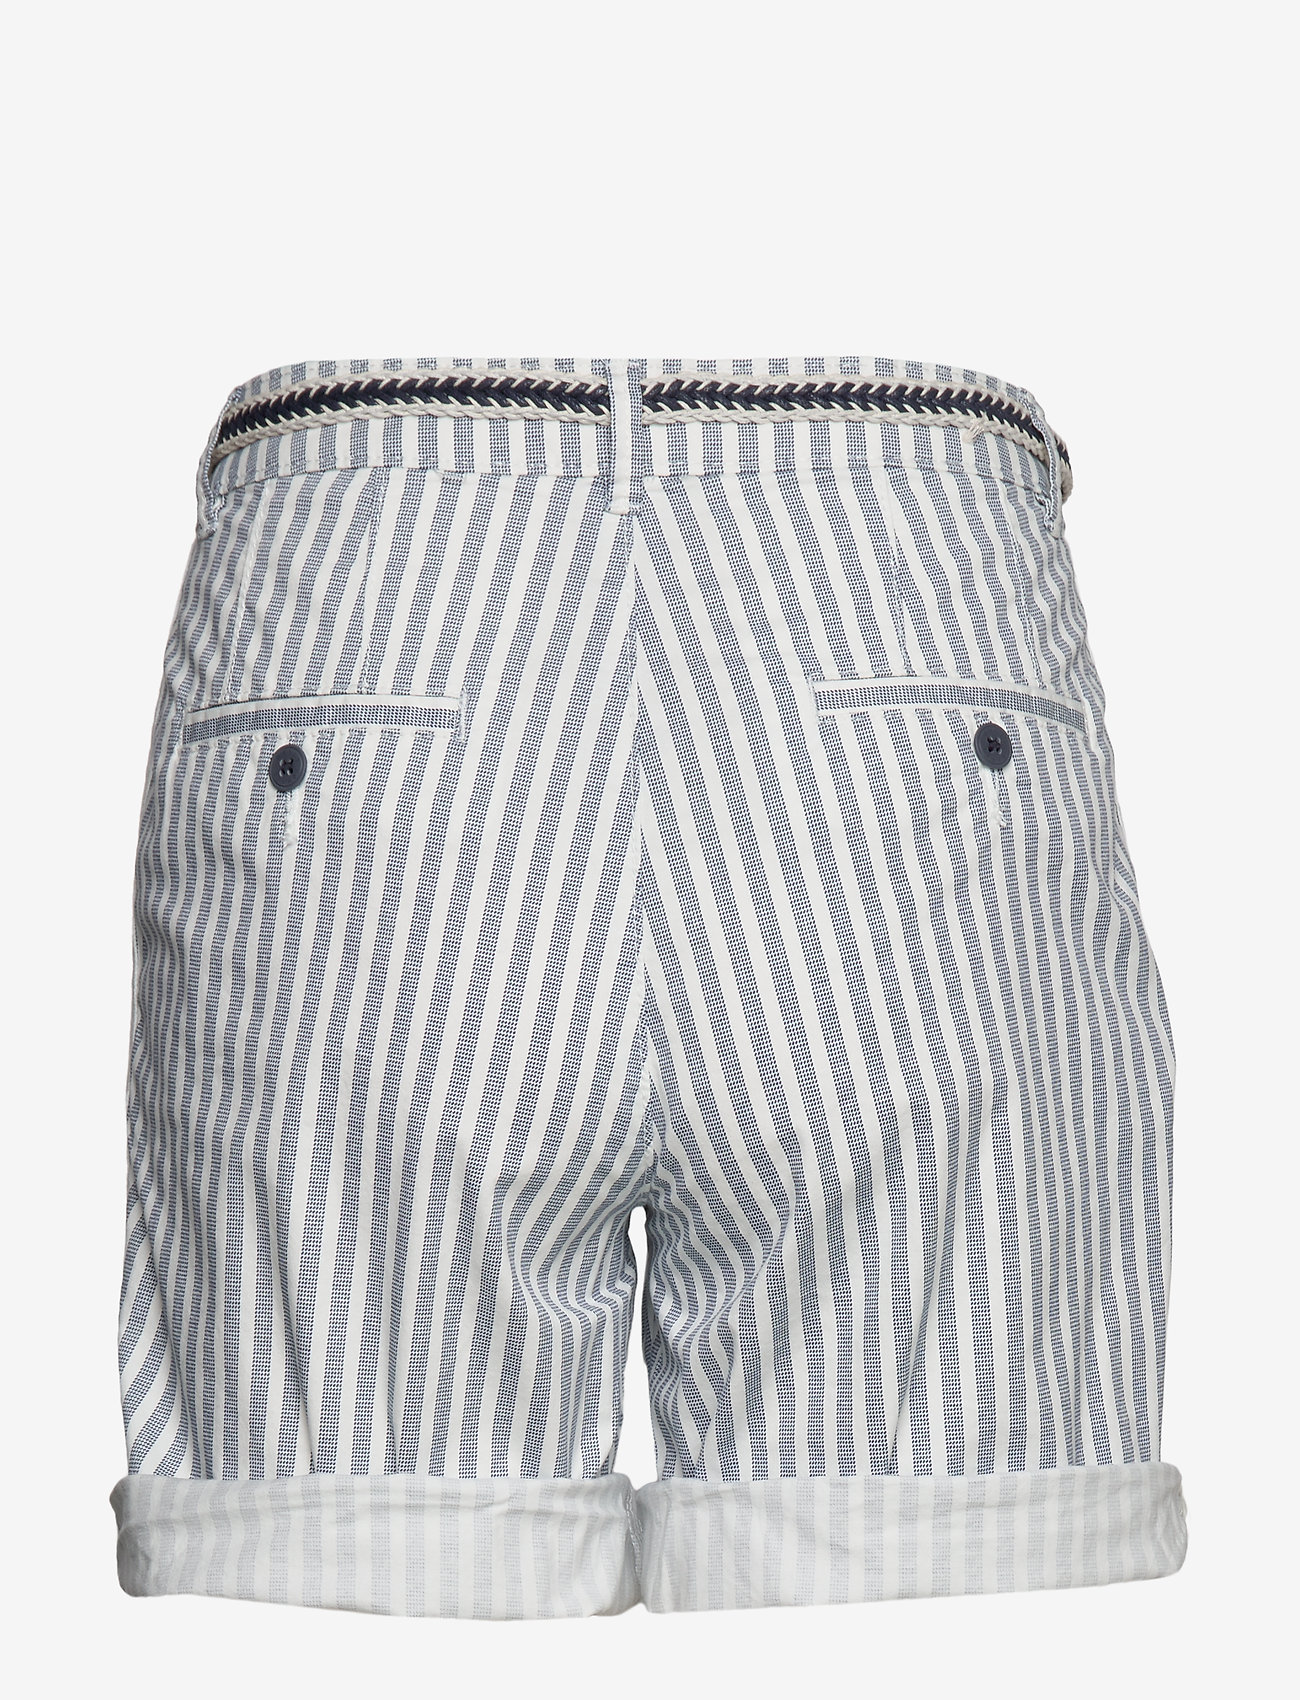 Esprit Casual - Shorts woven - casual shorts - grey blue - 1